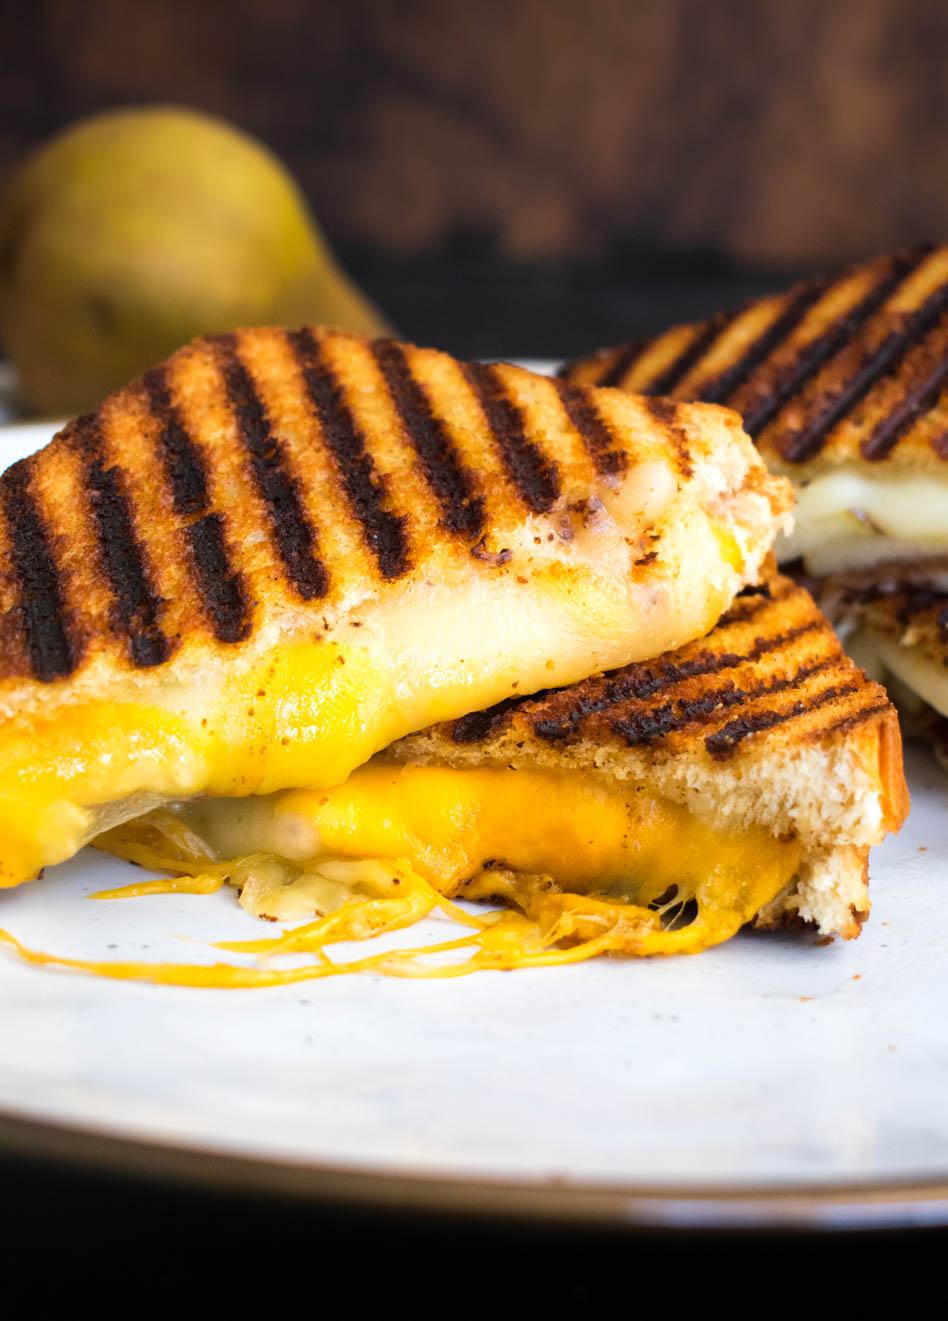 Grilled cheese de tres quesos